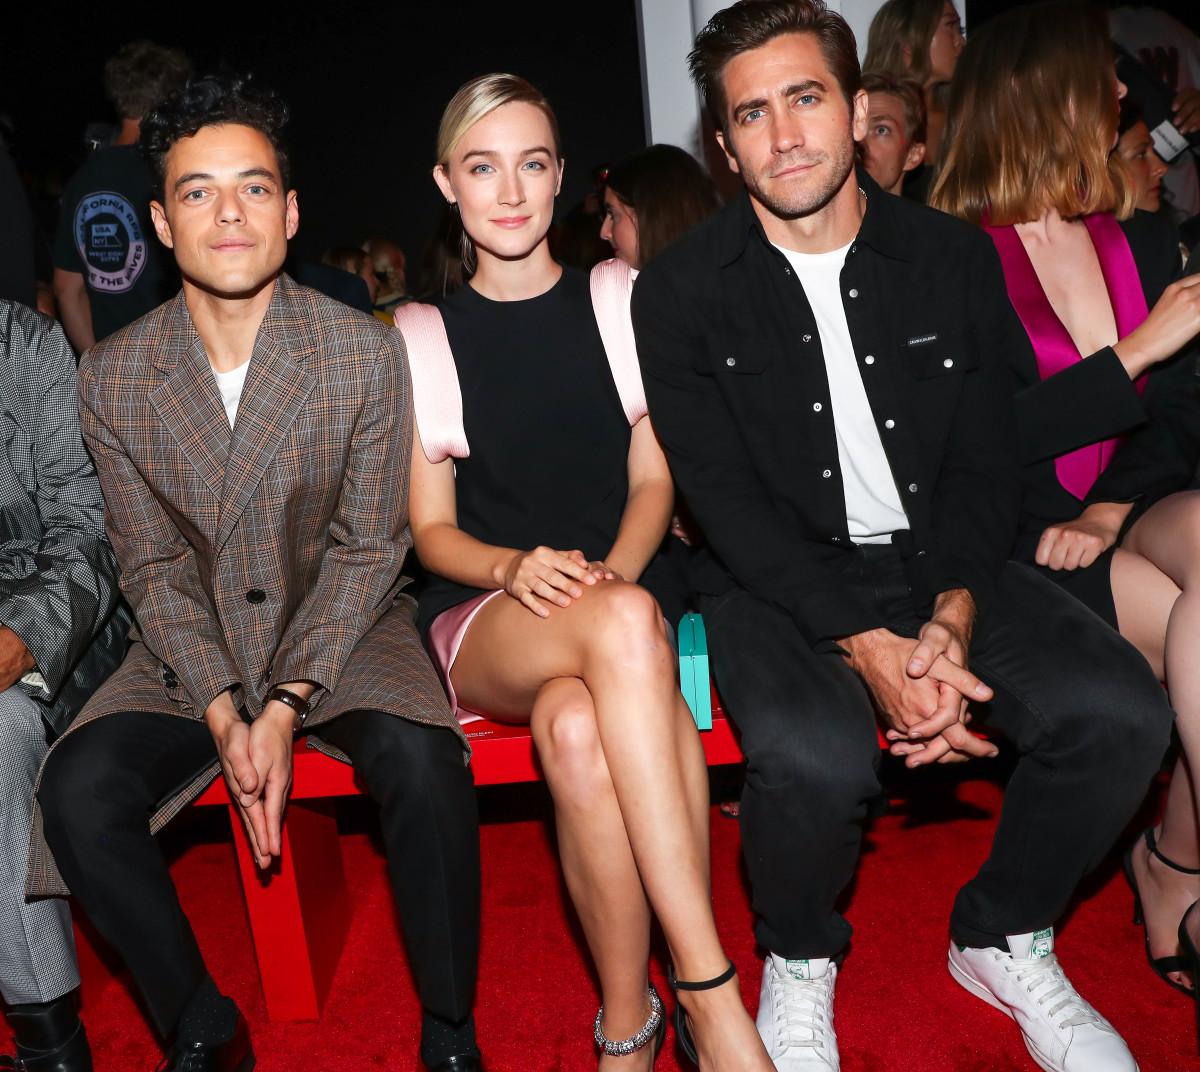 Rami Malek, Saoirse Ronan and Jake Gyllenhaal in the front row at Calvin Klein's Spring 2019 runway show. Photo: BFA/Courtesy of Calvin Klein